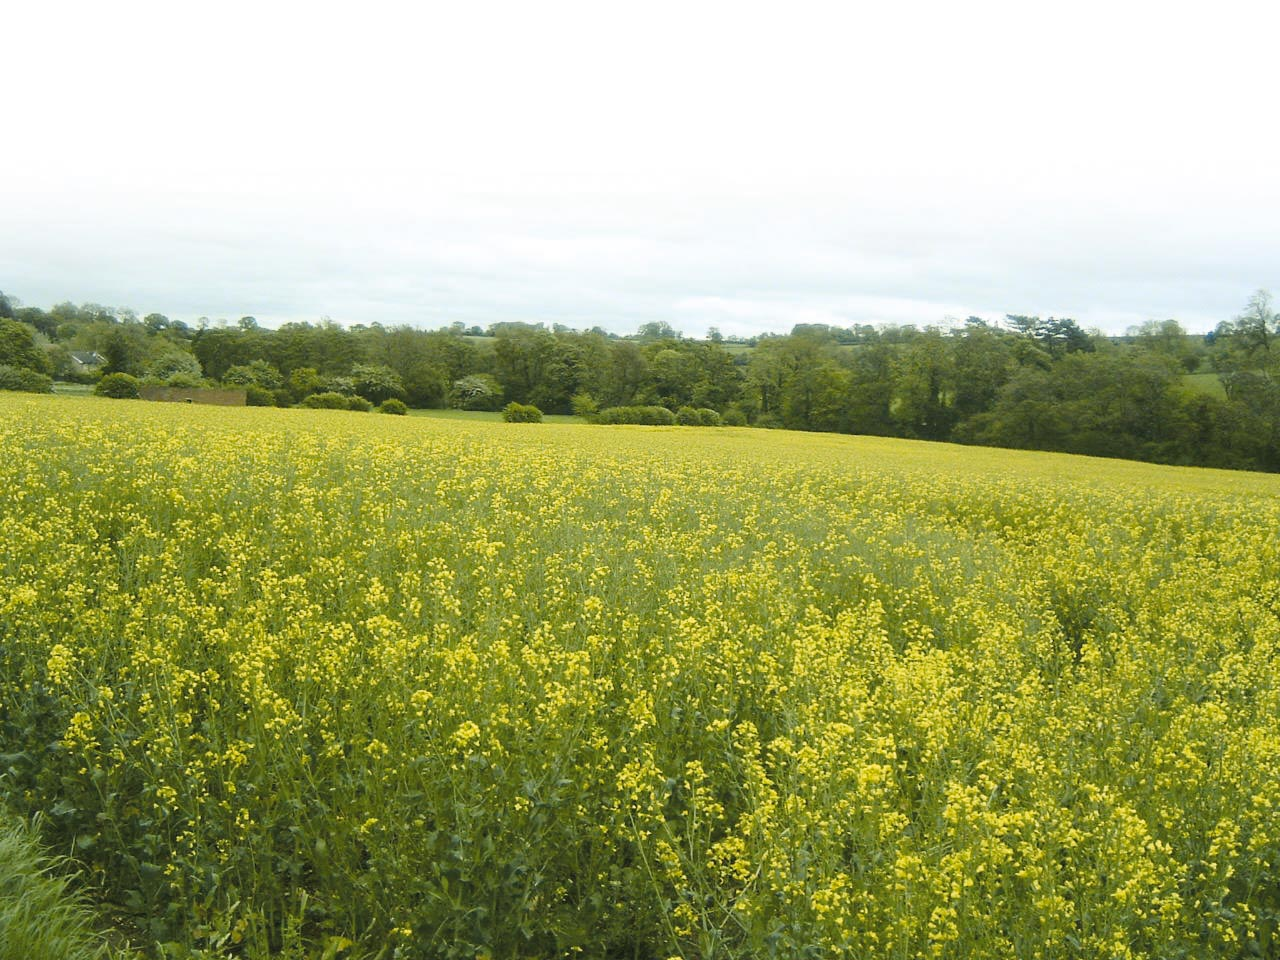 Wharfe Valley Farms - Rapeseed Field